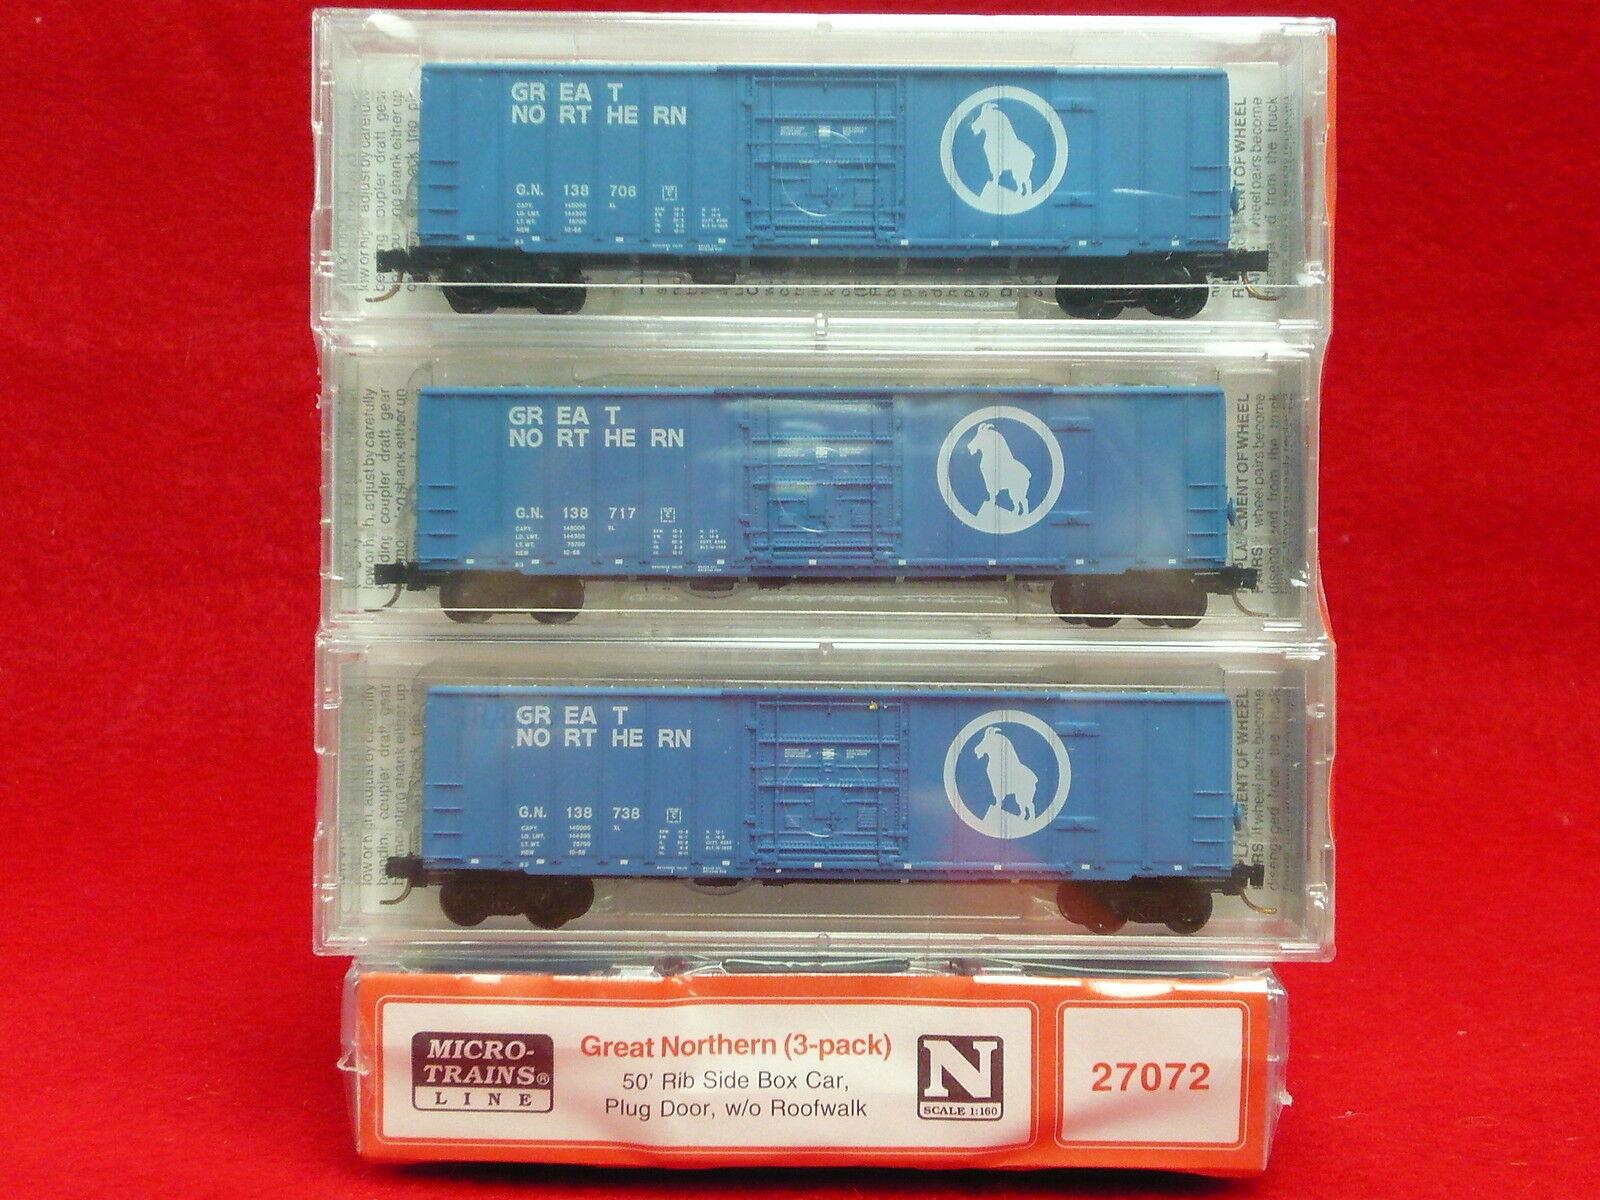 27072 Micro-Trains MTL Great Northern Box Car 3 Pk NIB